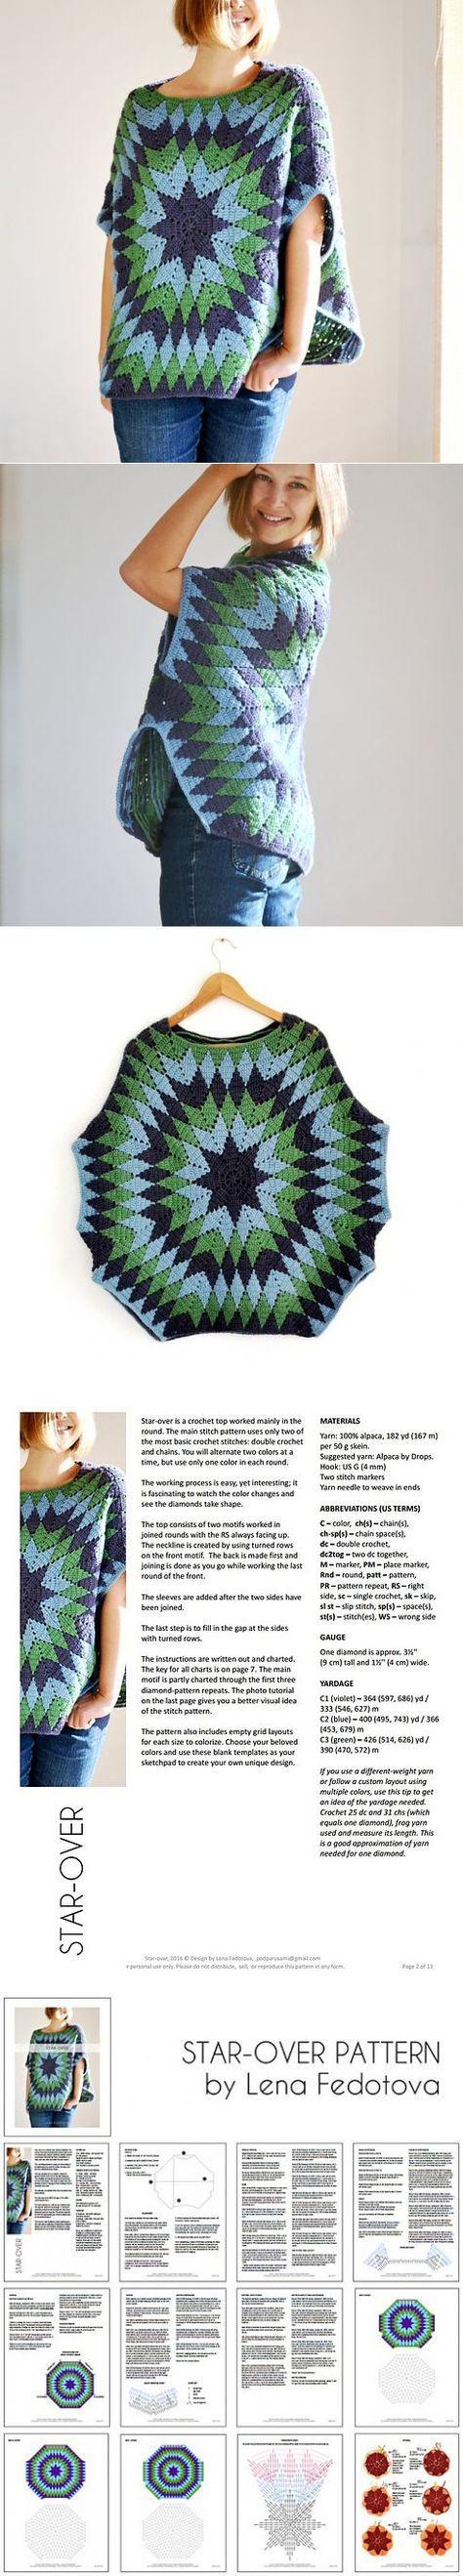 Crochet Start-over Poncho | Ganchillo, Ponchos y Patrones